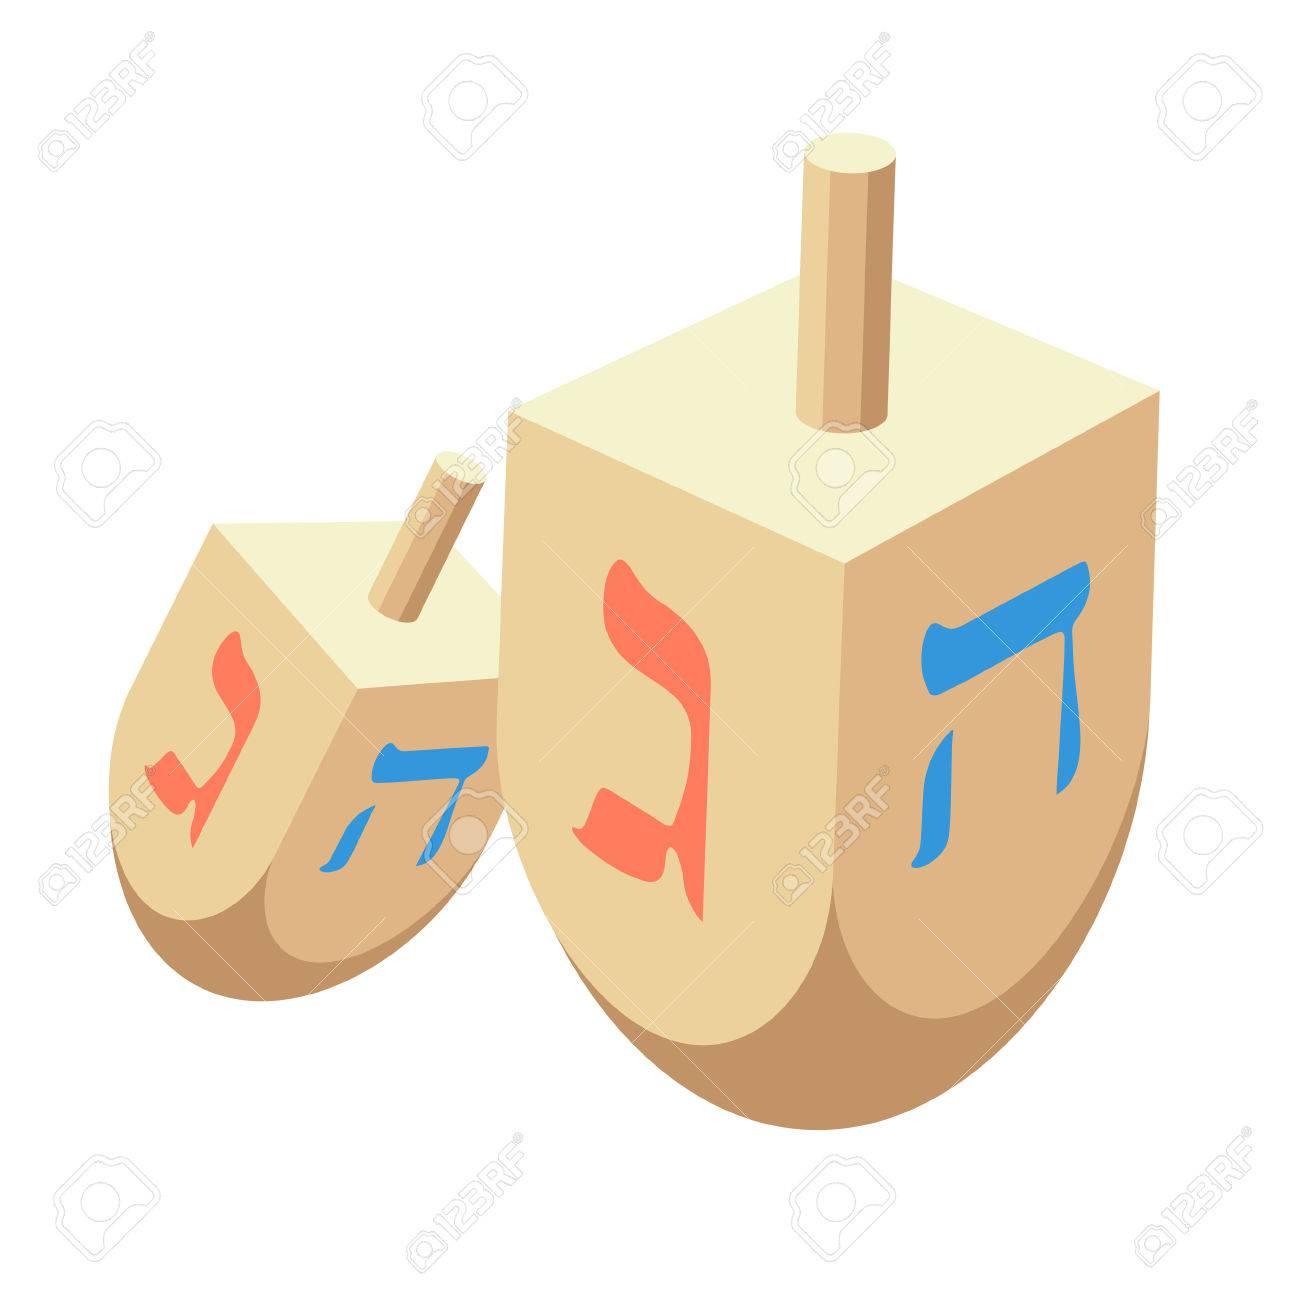 Symbols of hannukah images symbol and sign ideas dreidel vector illustration holiday of hanukkah element jewish holiday of hanukkah element jewish symbol for celebration biocorpaavc